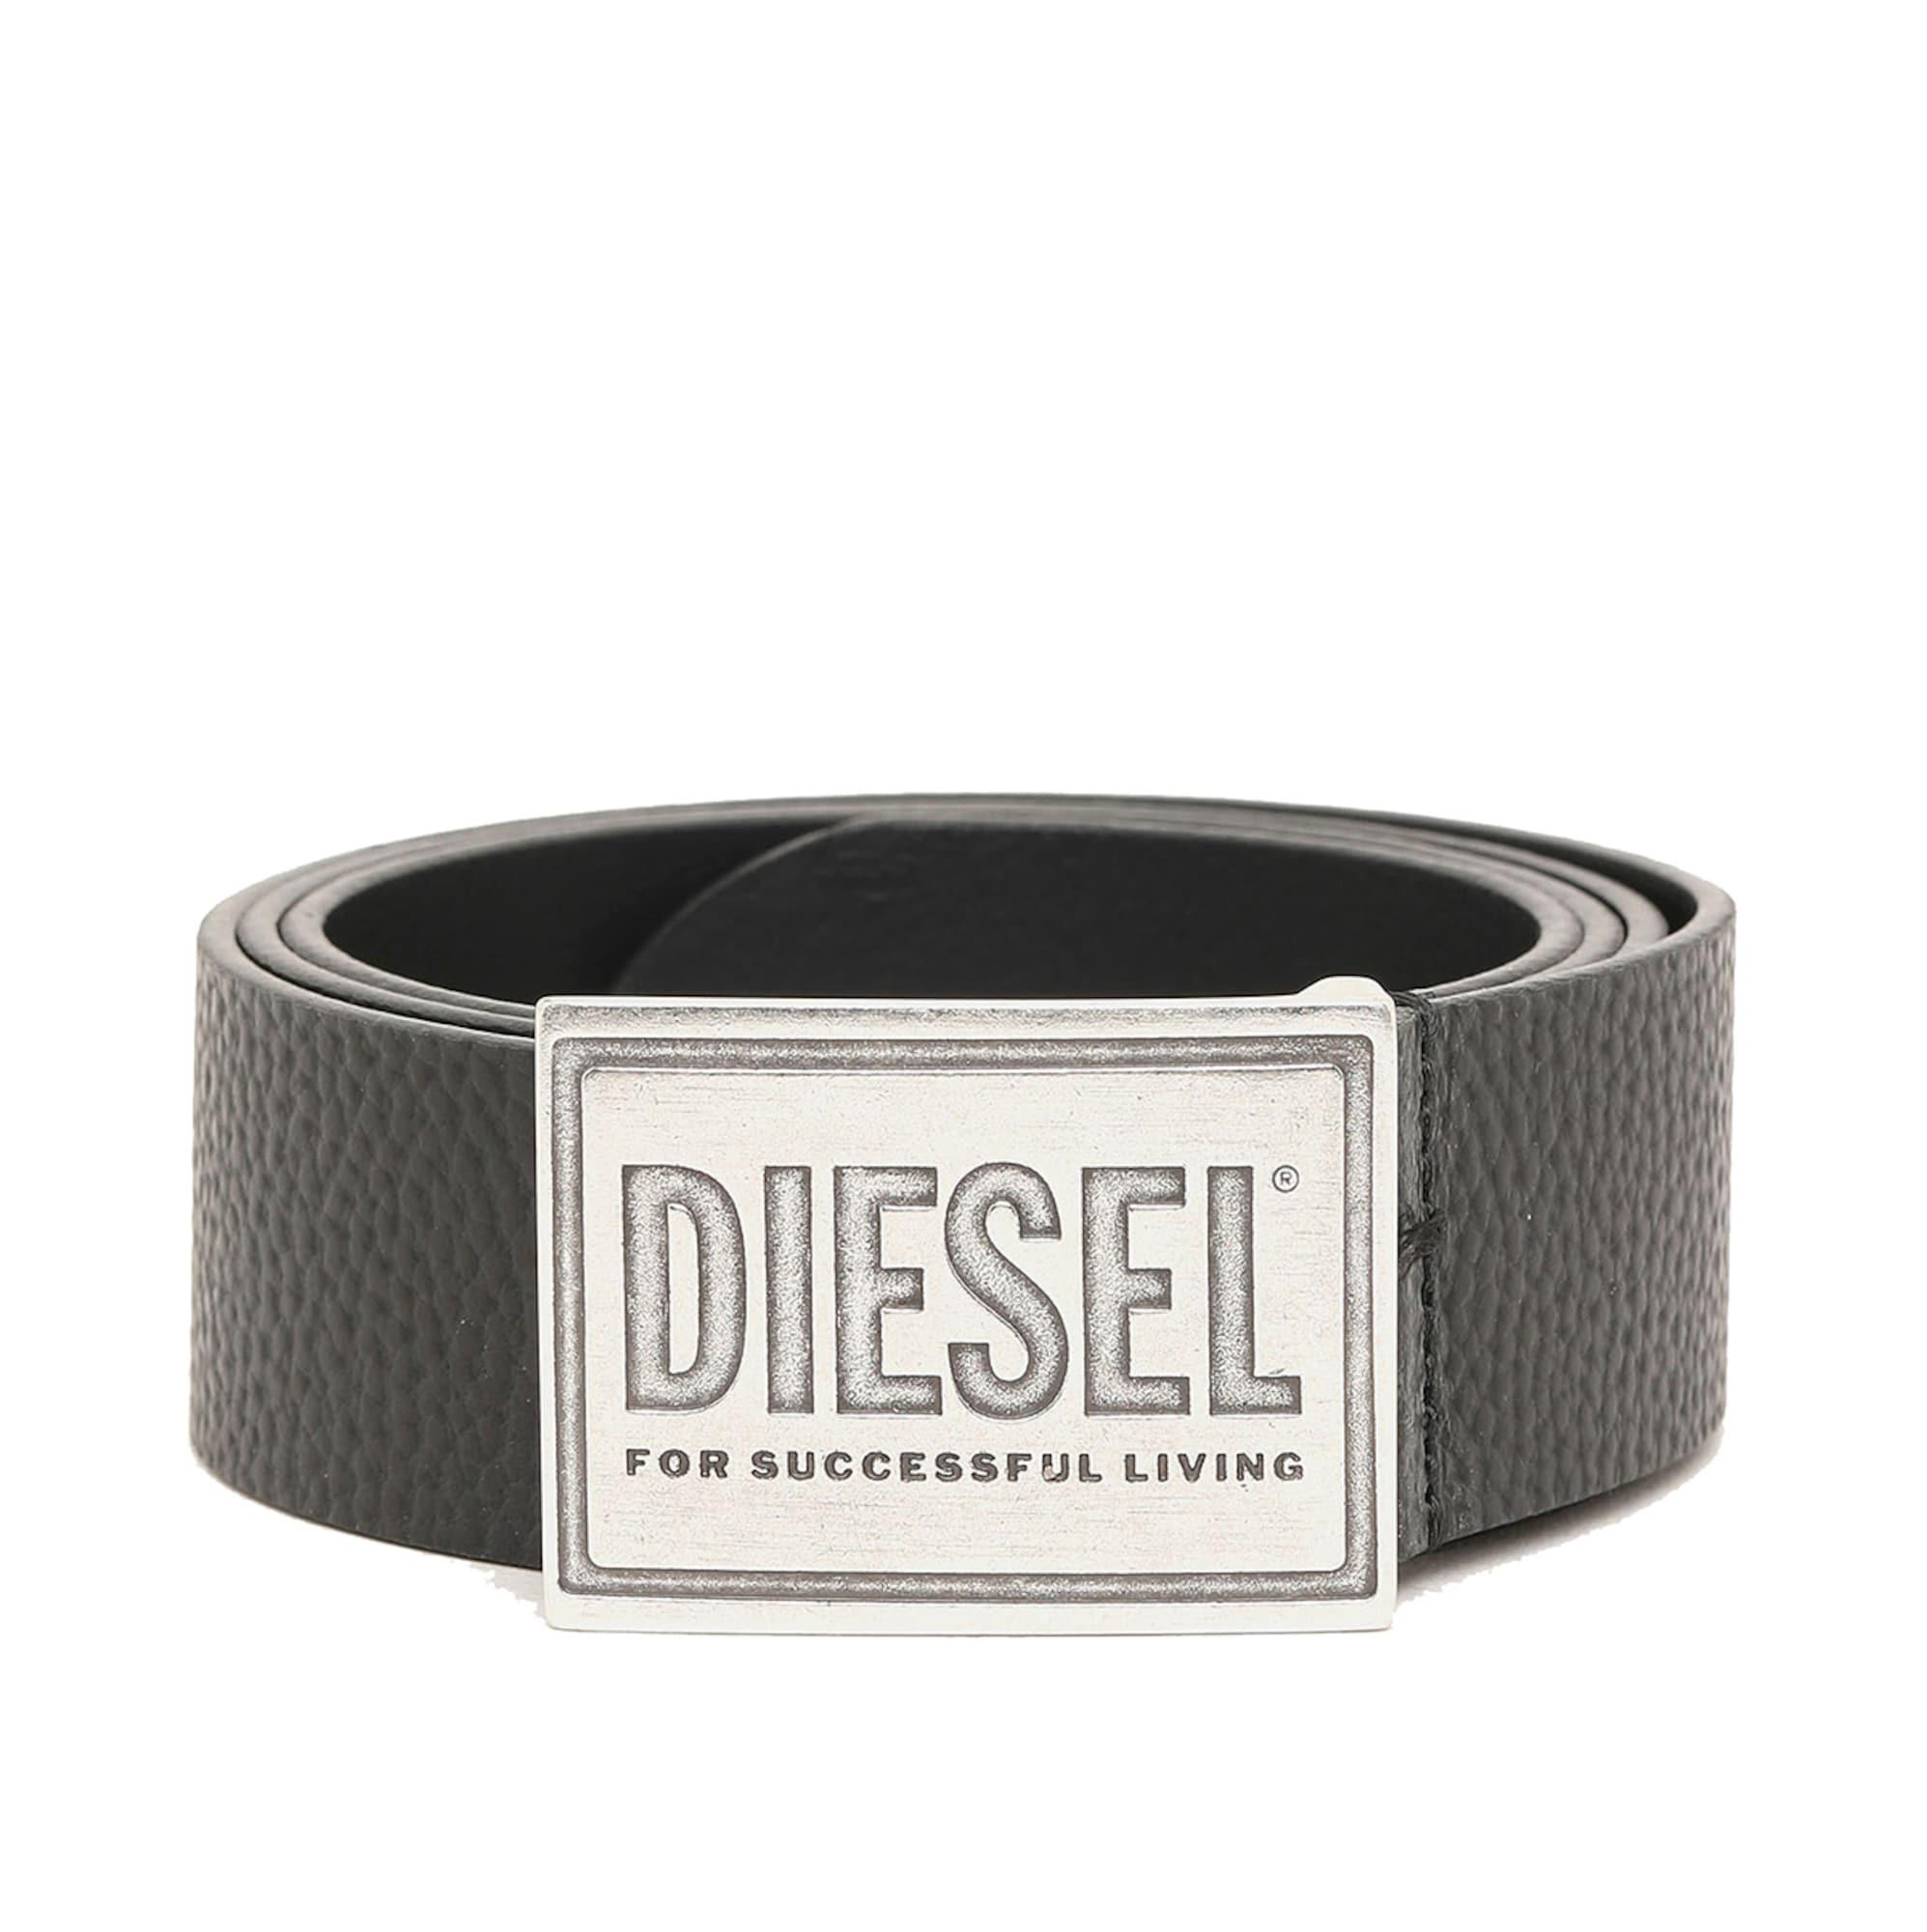 Diesel Ceinture 'B-GRAIN'  - Noir - Taille: 105 - male